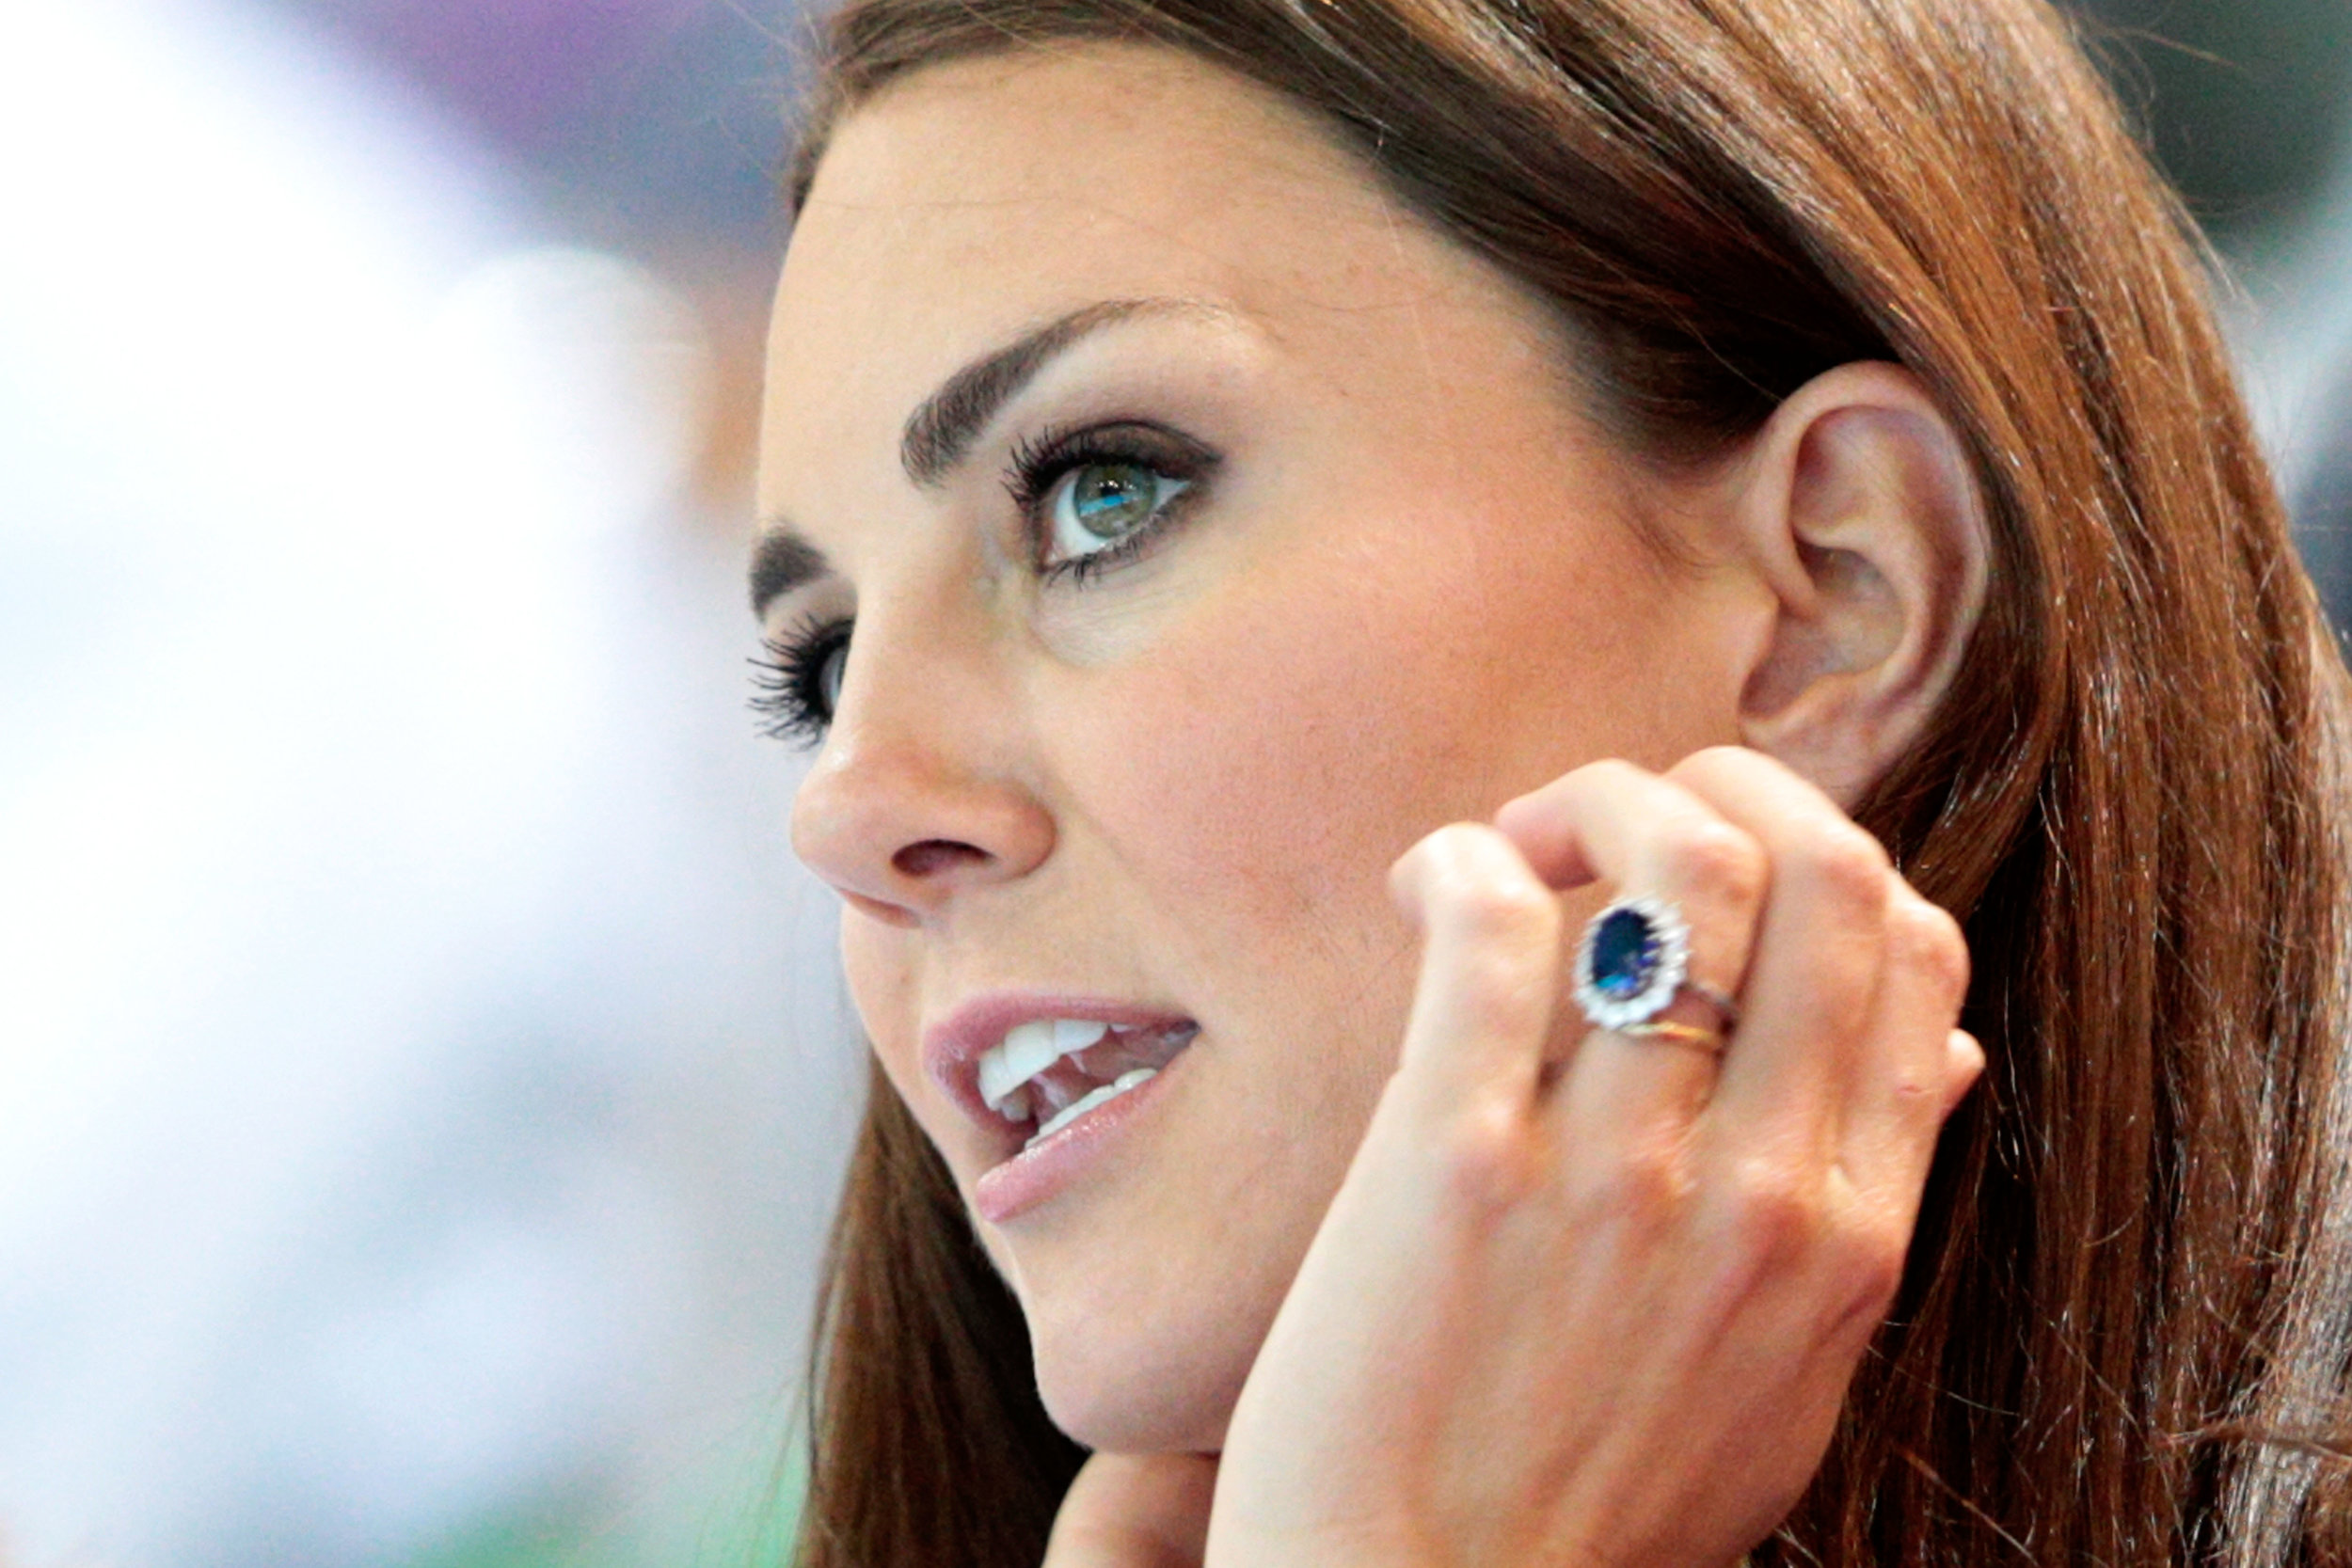 kate-middleton-wedding-ring-cool-design-15-on-ring-design-ideas.jpg